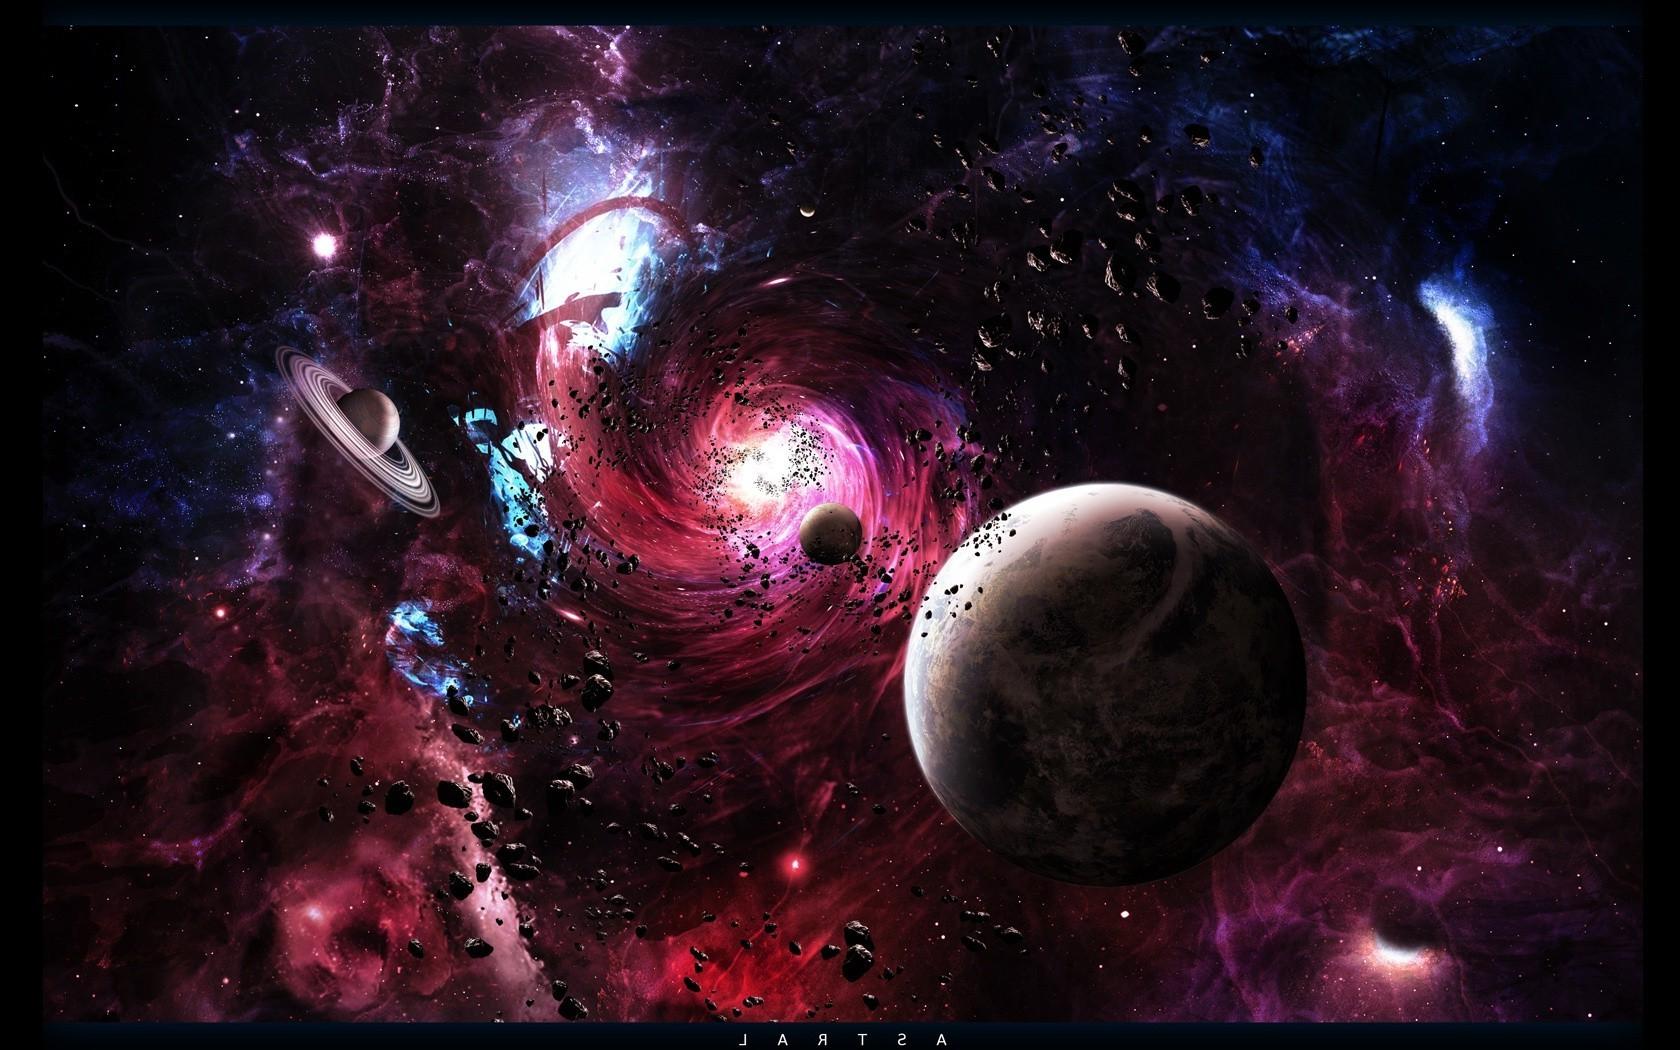 Space Galaxy Wallpaper 1680x1050 Download Hd Wallpaper Wallpapertip